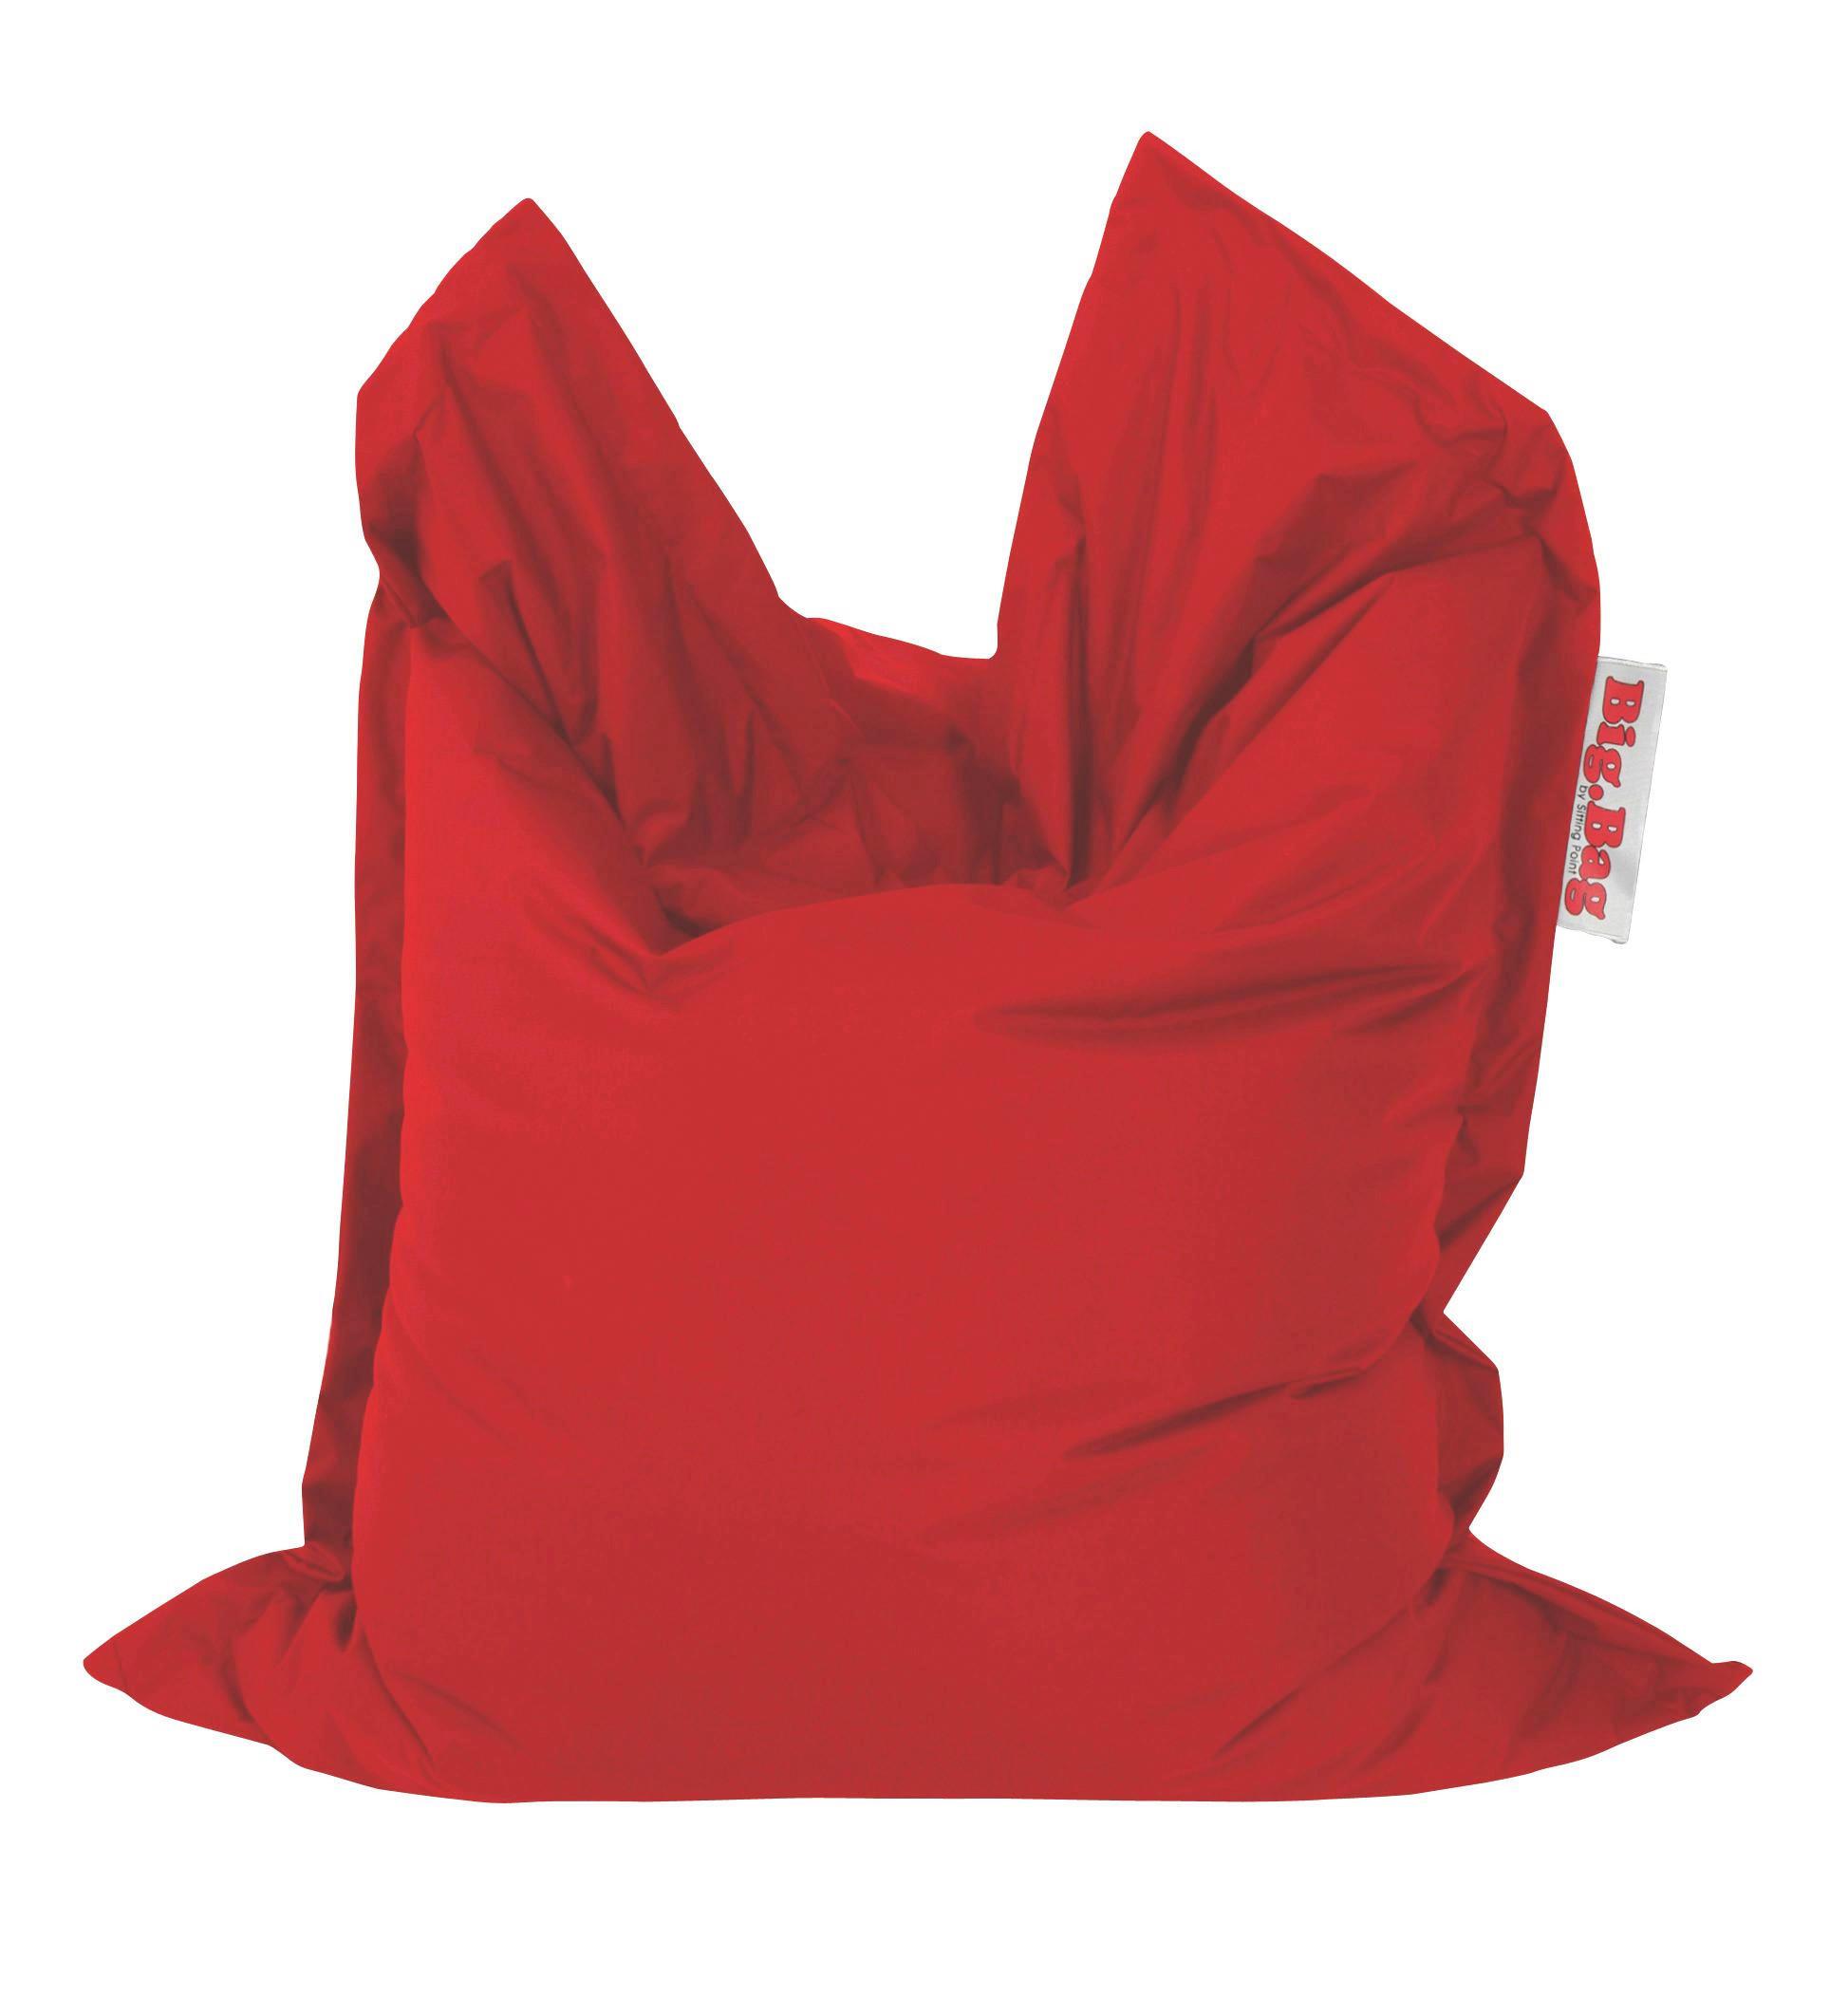 SITZSACK in Rot Textil - Rot, MODERN, Textil (130/170cm)